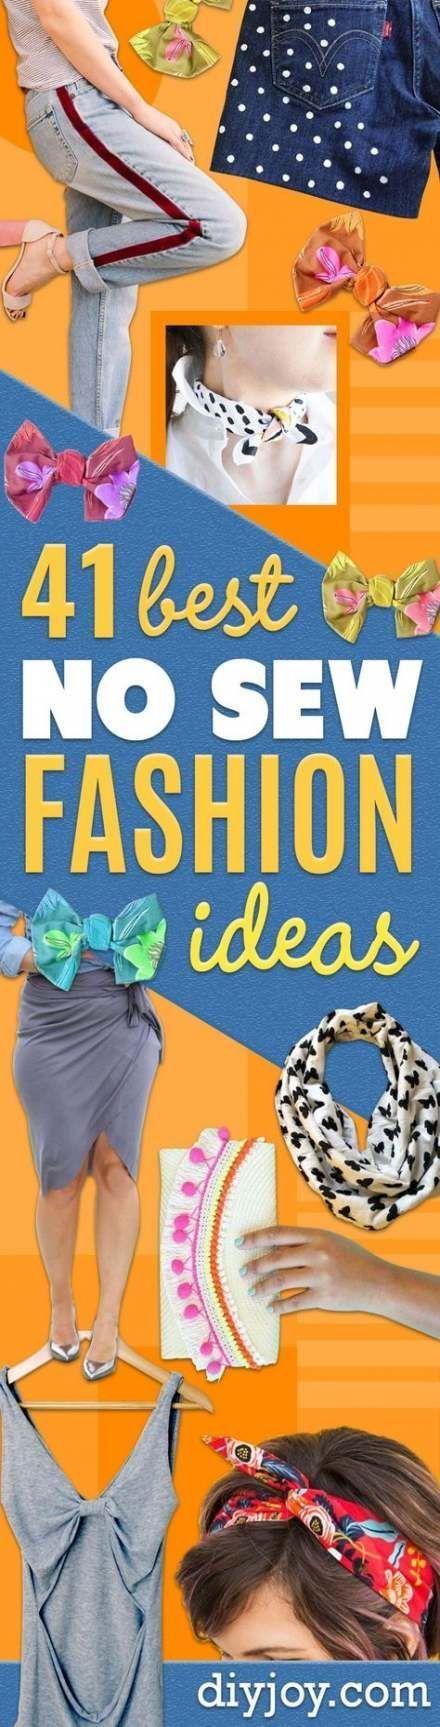 60 Ideas Clothes Diy Ideas Shirts No Sew For 2019 #nosewshirts 60 Ideas Clothes Diy Ideas Shirts No Sew For 2019 #diy #clothes... #Clothes #DIY #Ideas #Sew #Shirts #nosewshirts